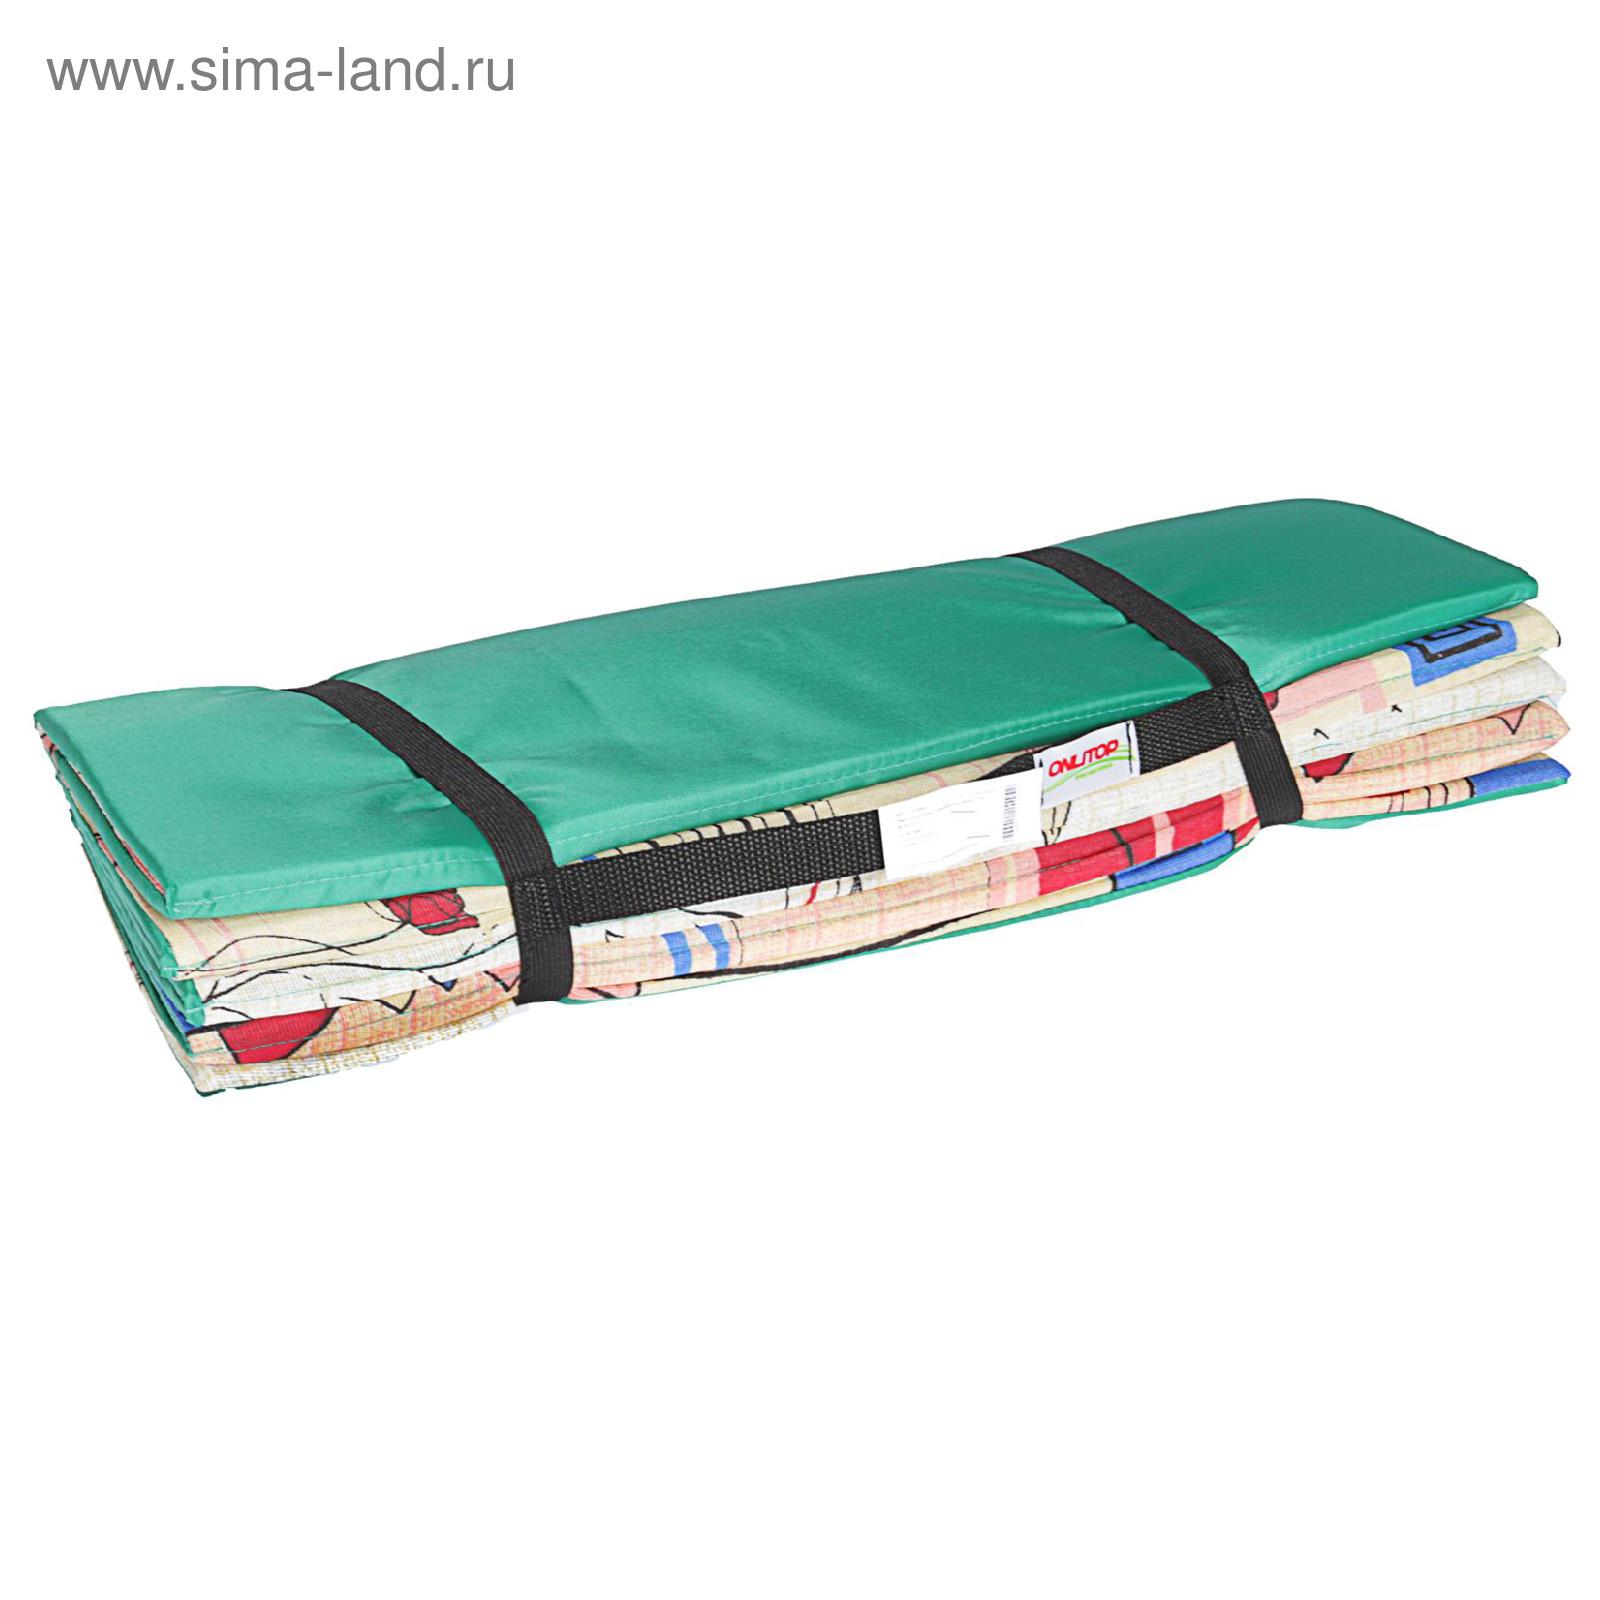 Коврик для фитнеса, пляжа, цвета МИКС (1115494) - Купить по цене от ... f6e83c6a78b